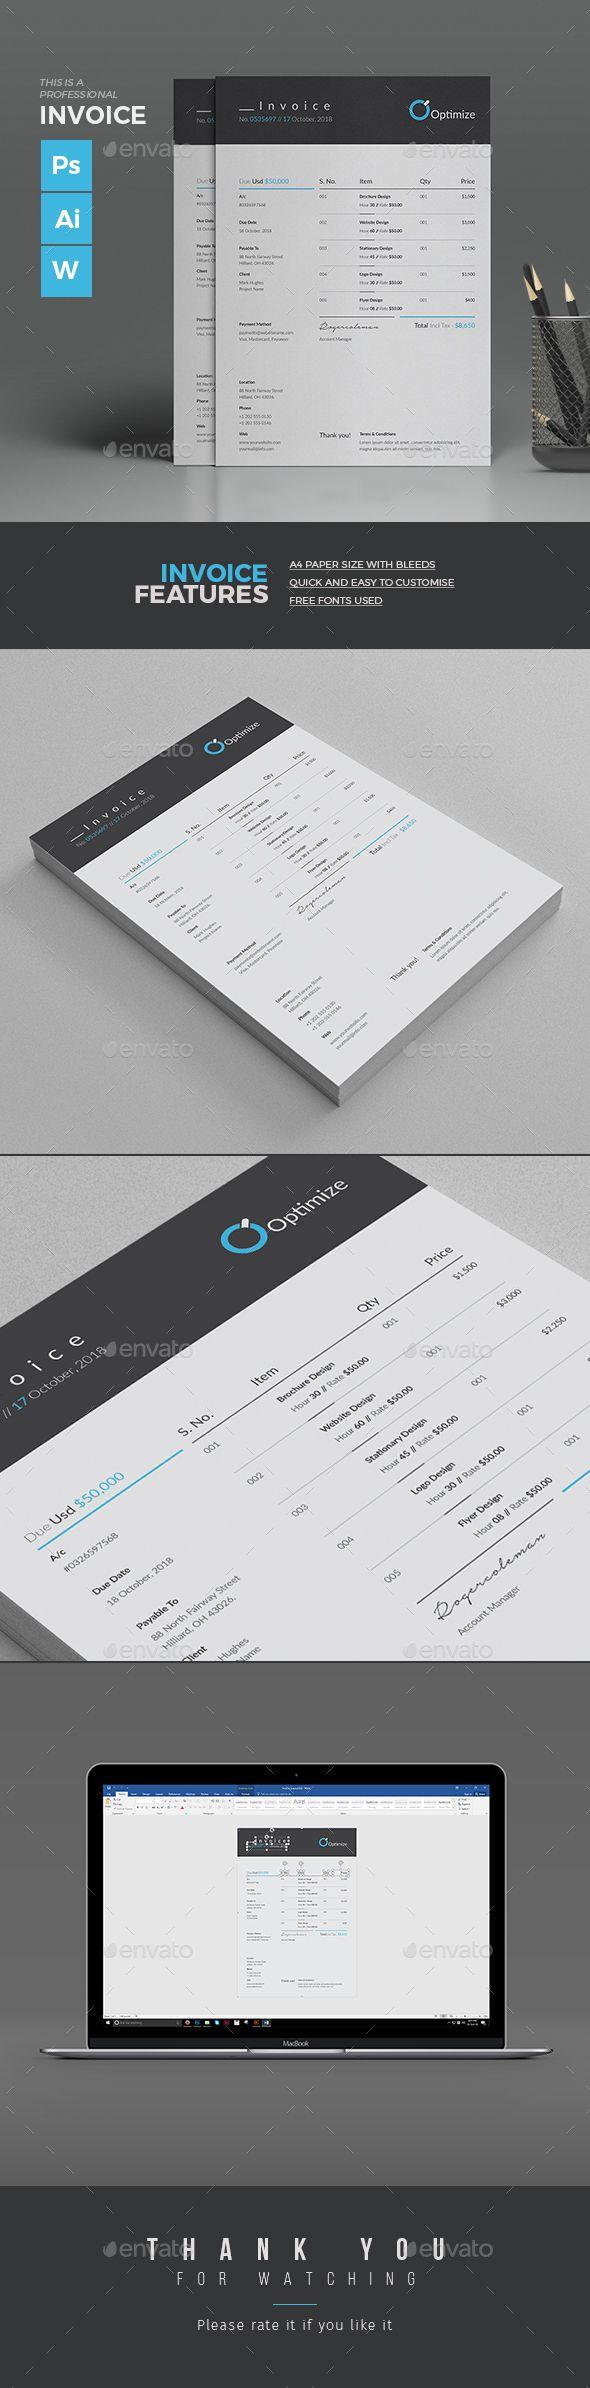 Best 20 word template design ideas on pinterest for Https invoice generator com 1